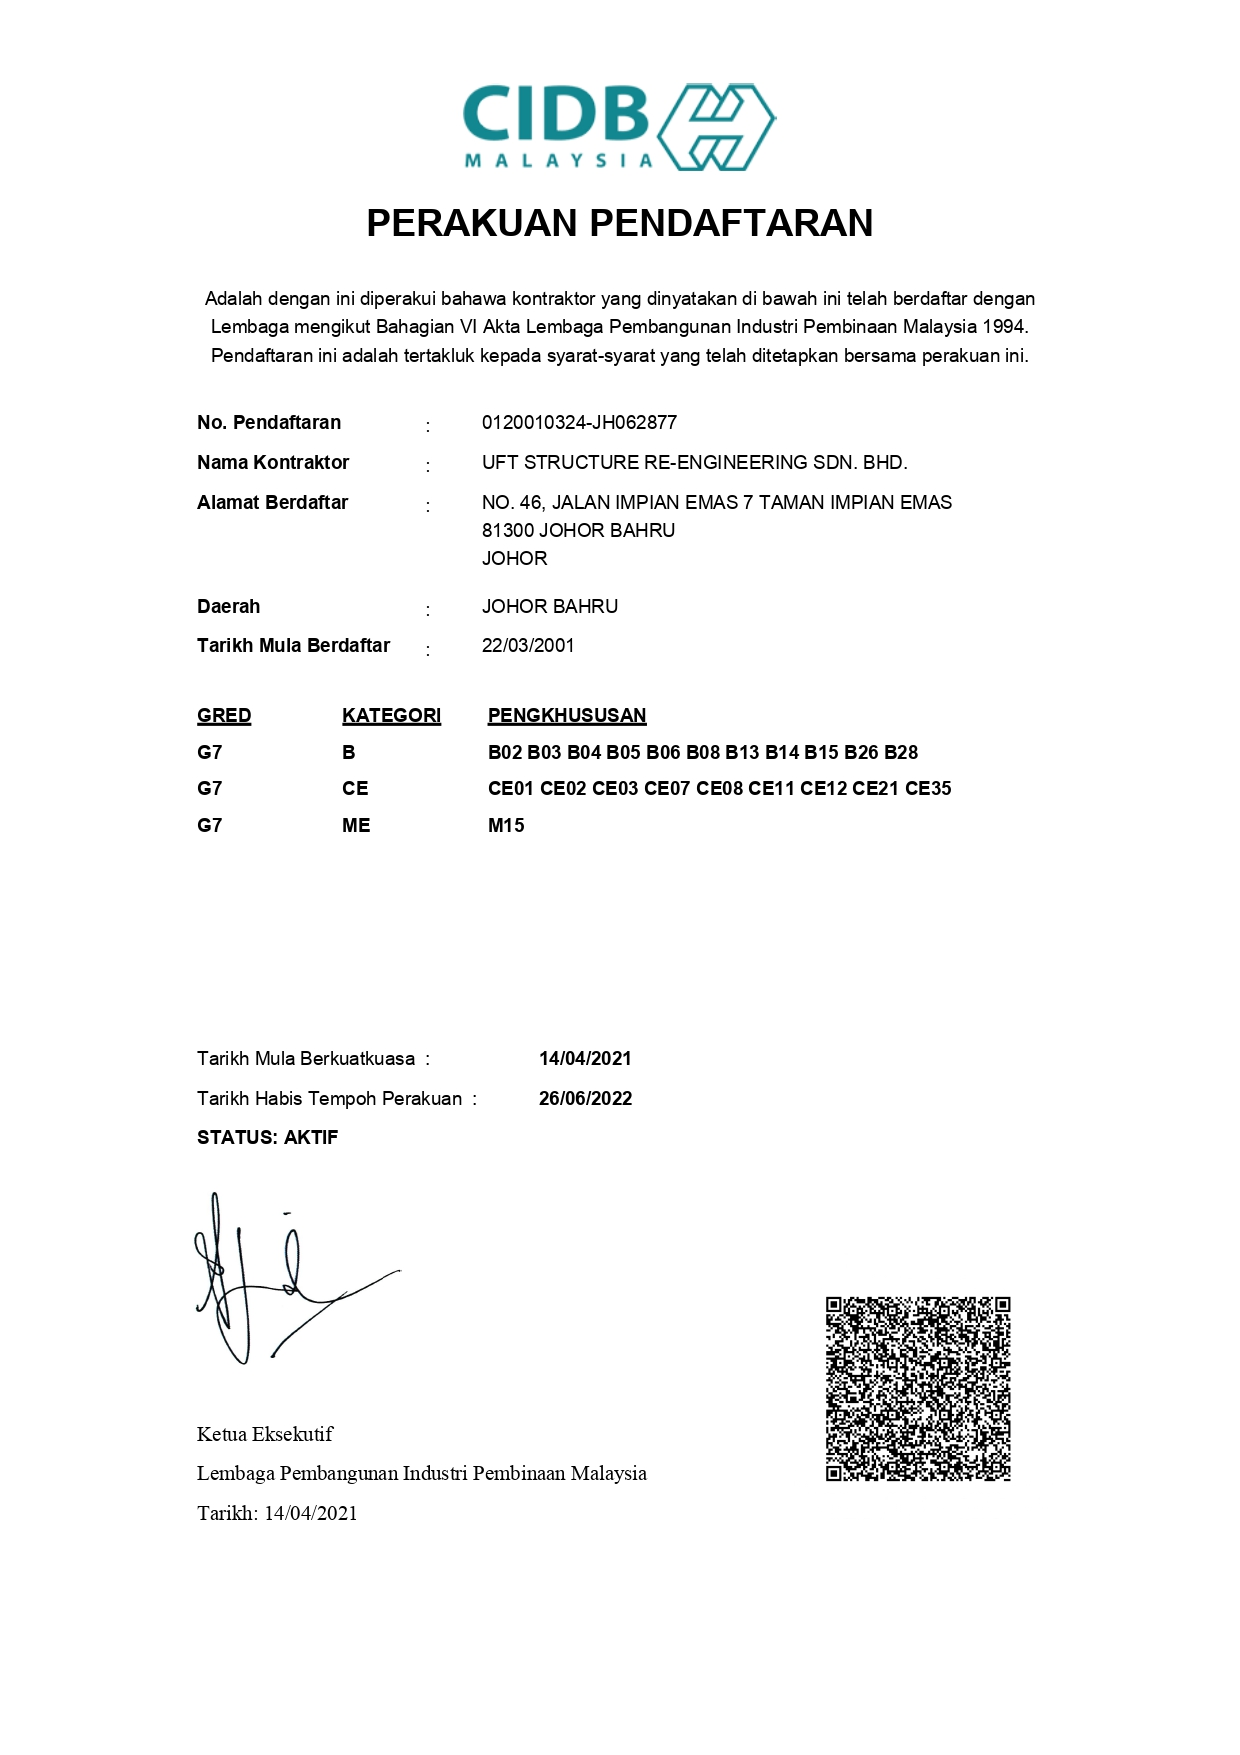 CIDB CERT G7 EXP 26062022_page-0001